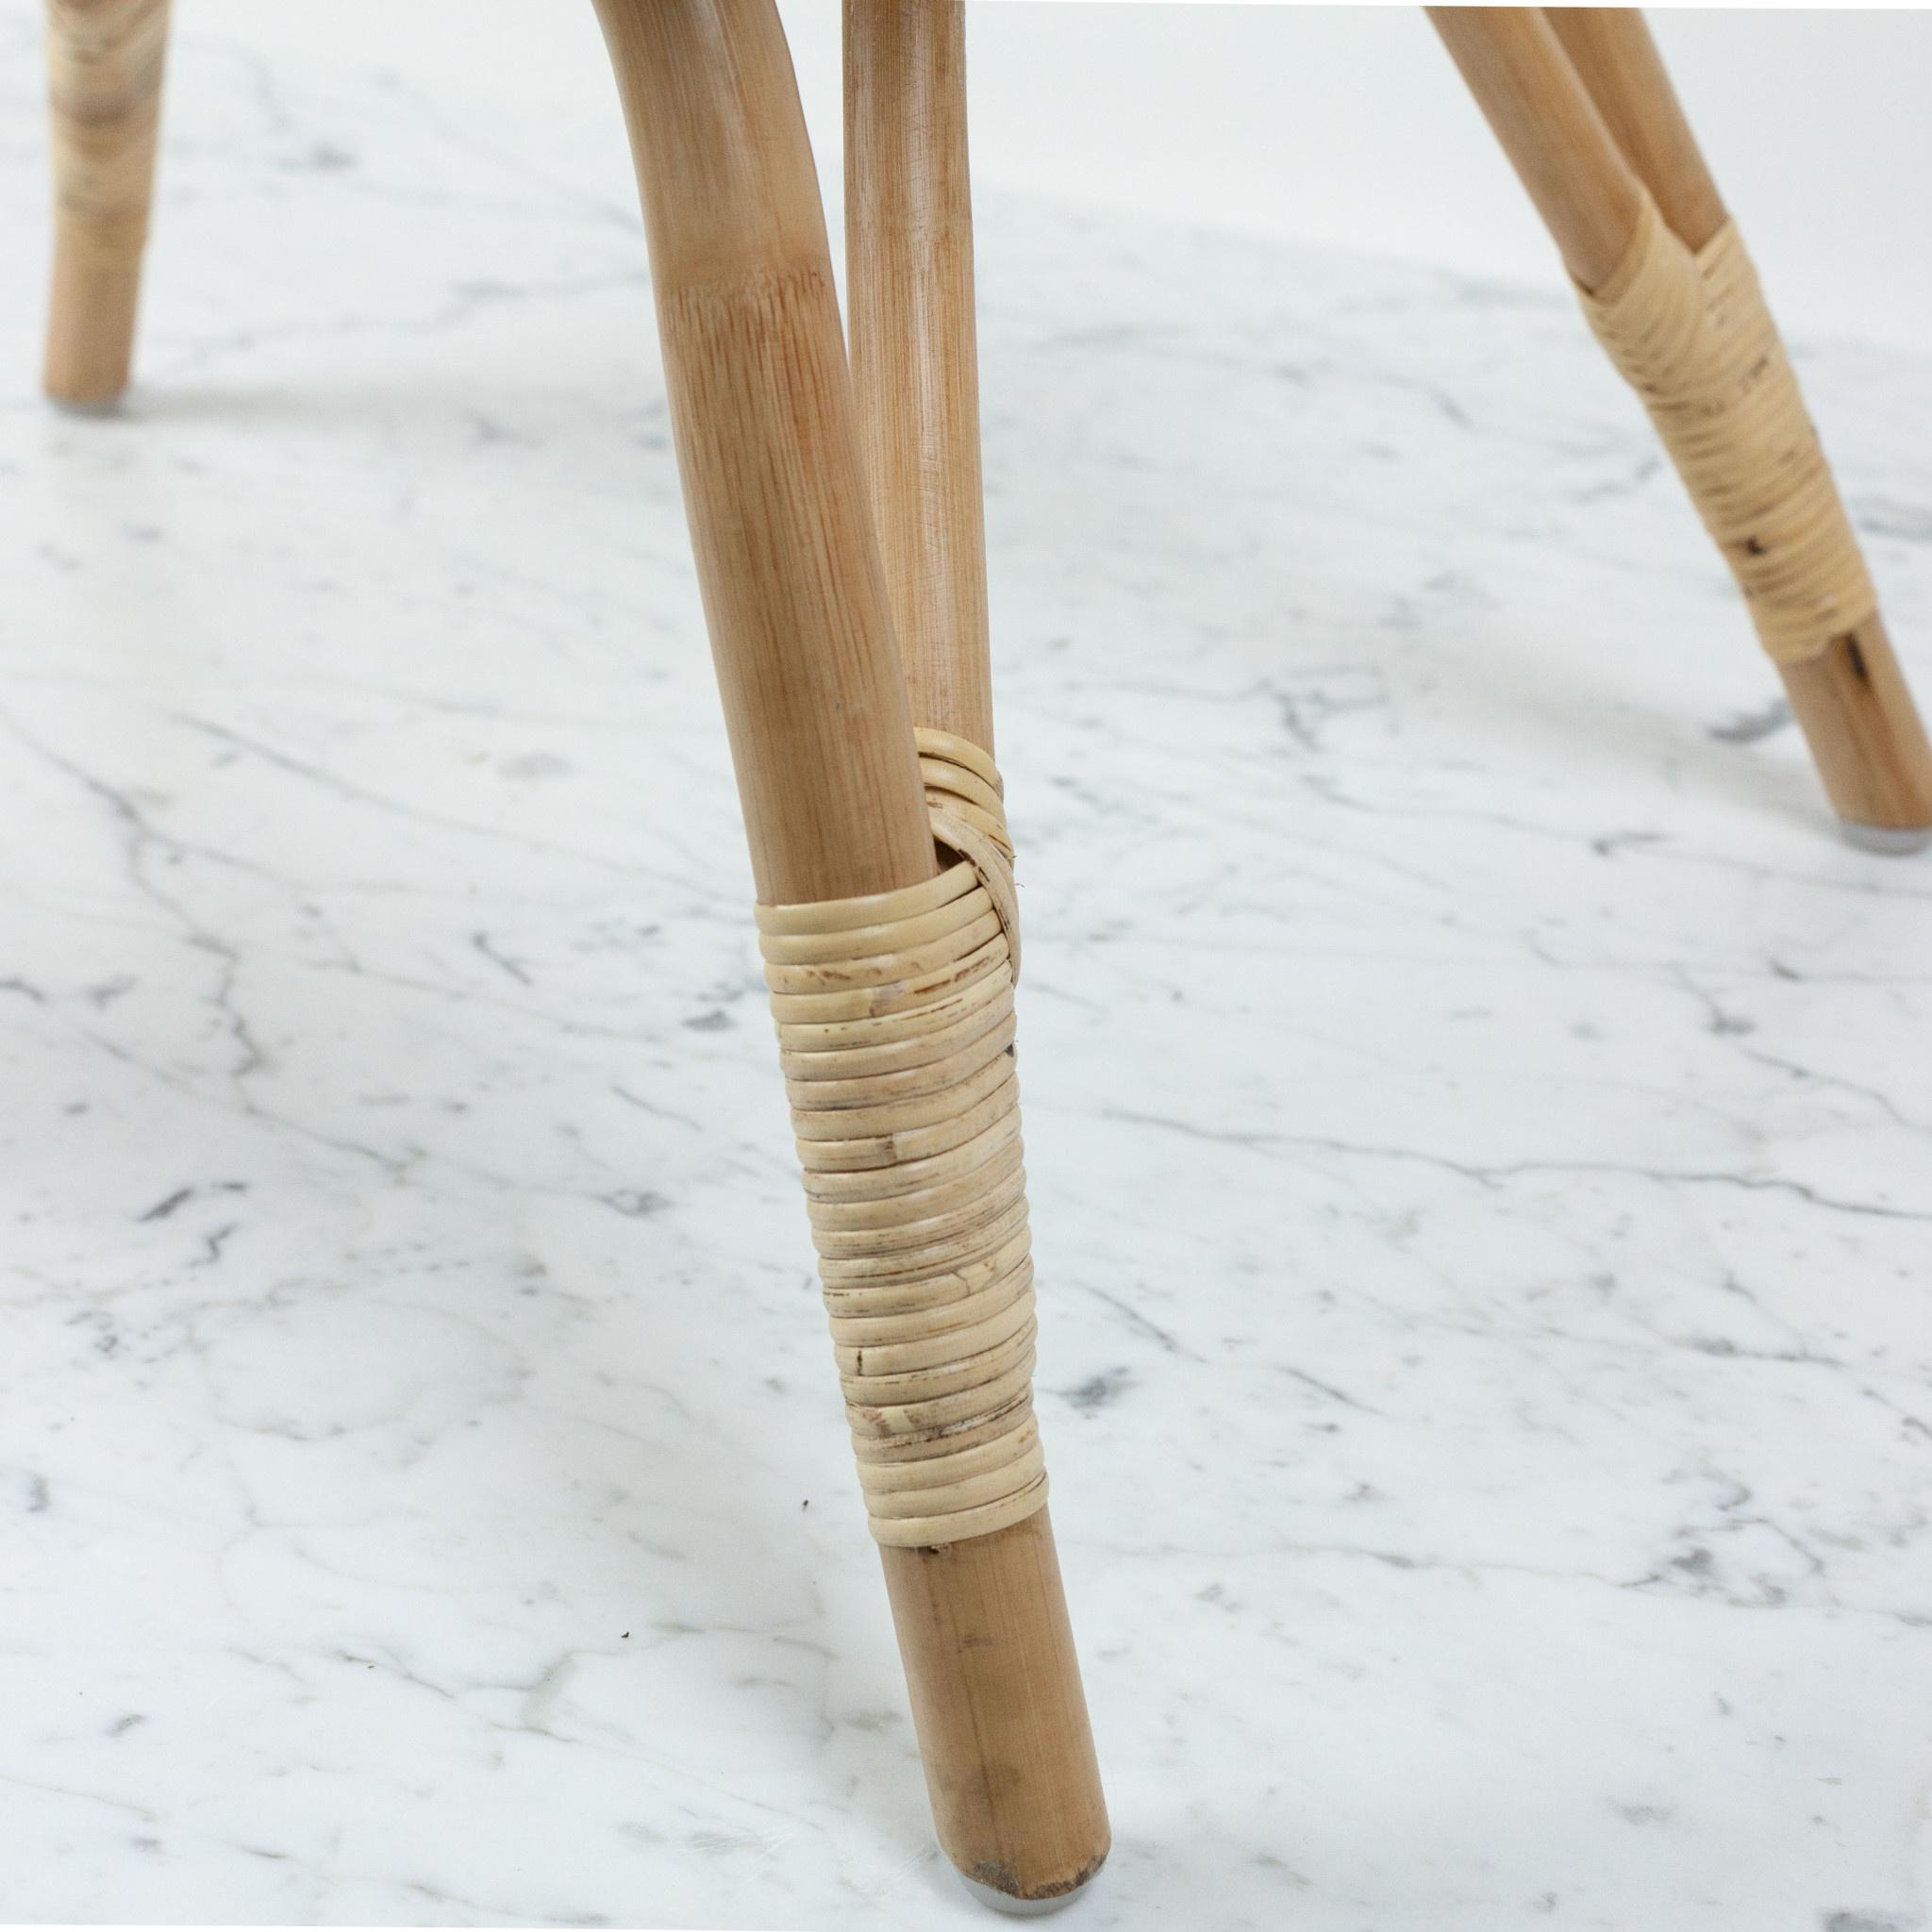 Sika-Design Monet Rattan Footstool - Natural